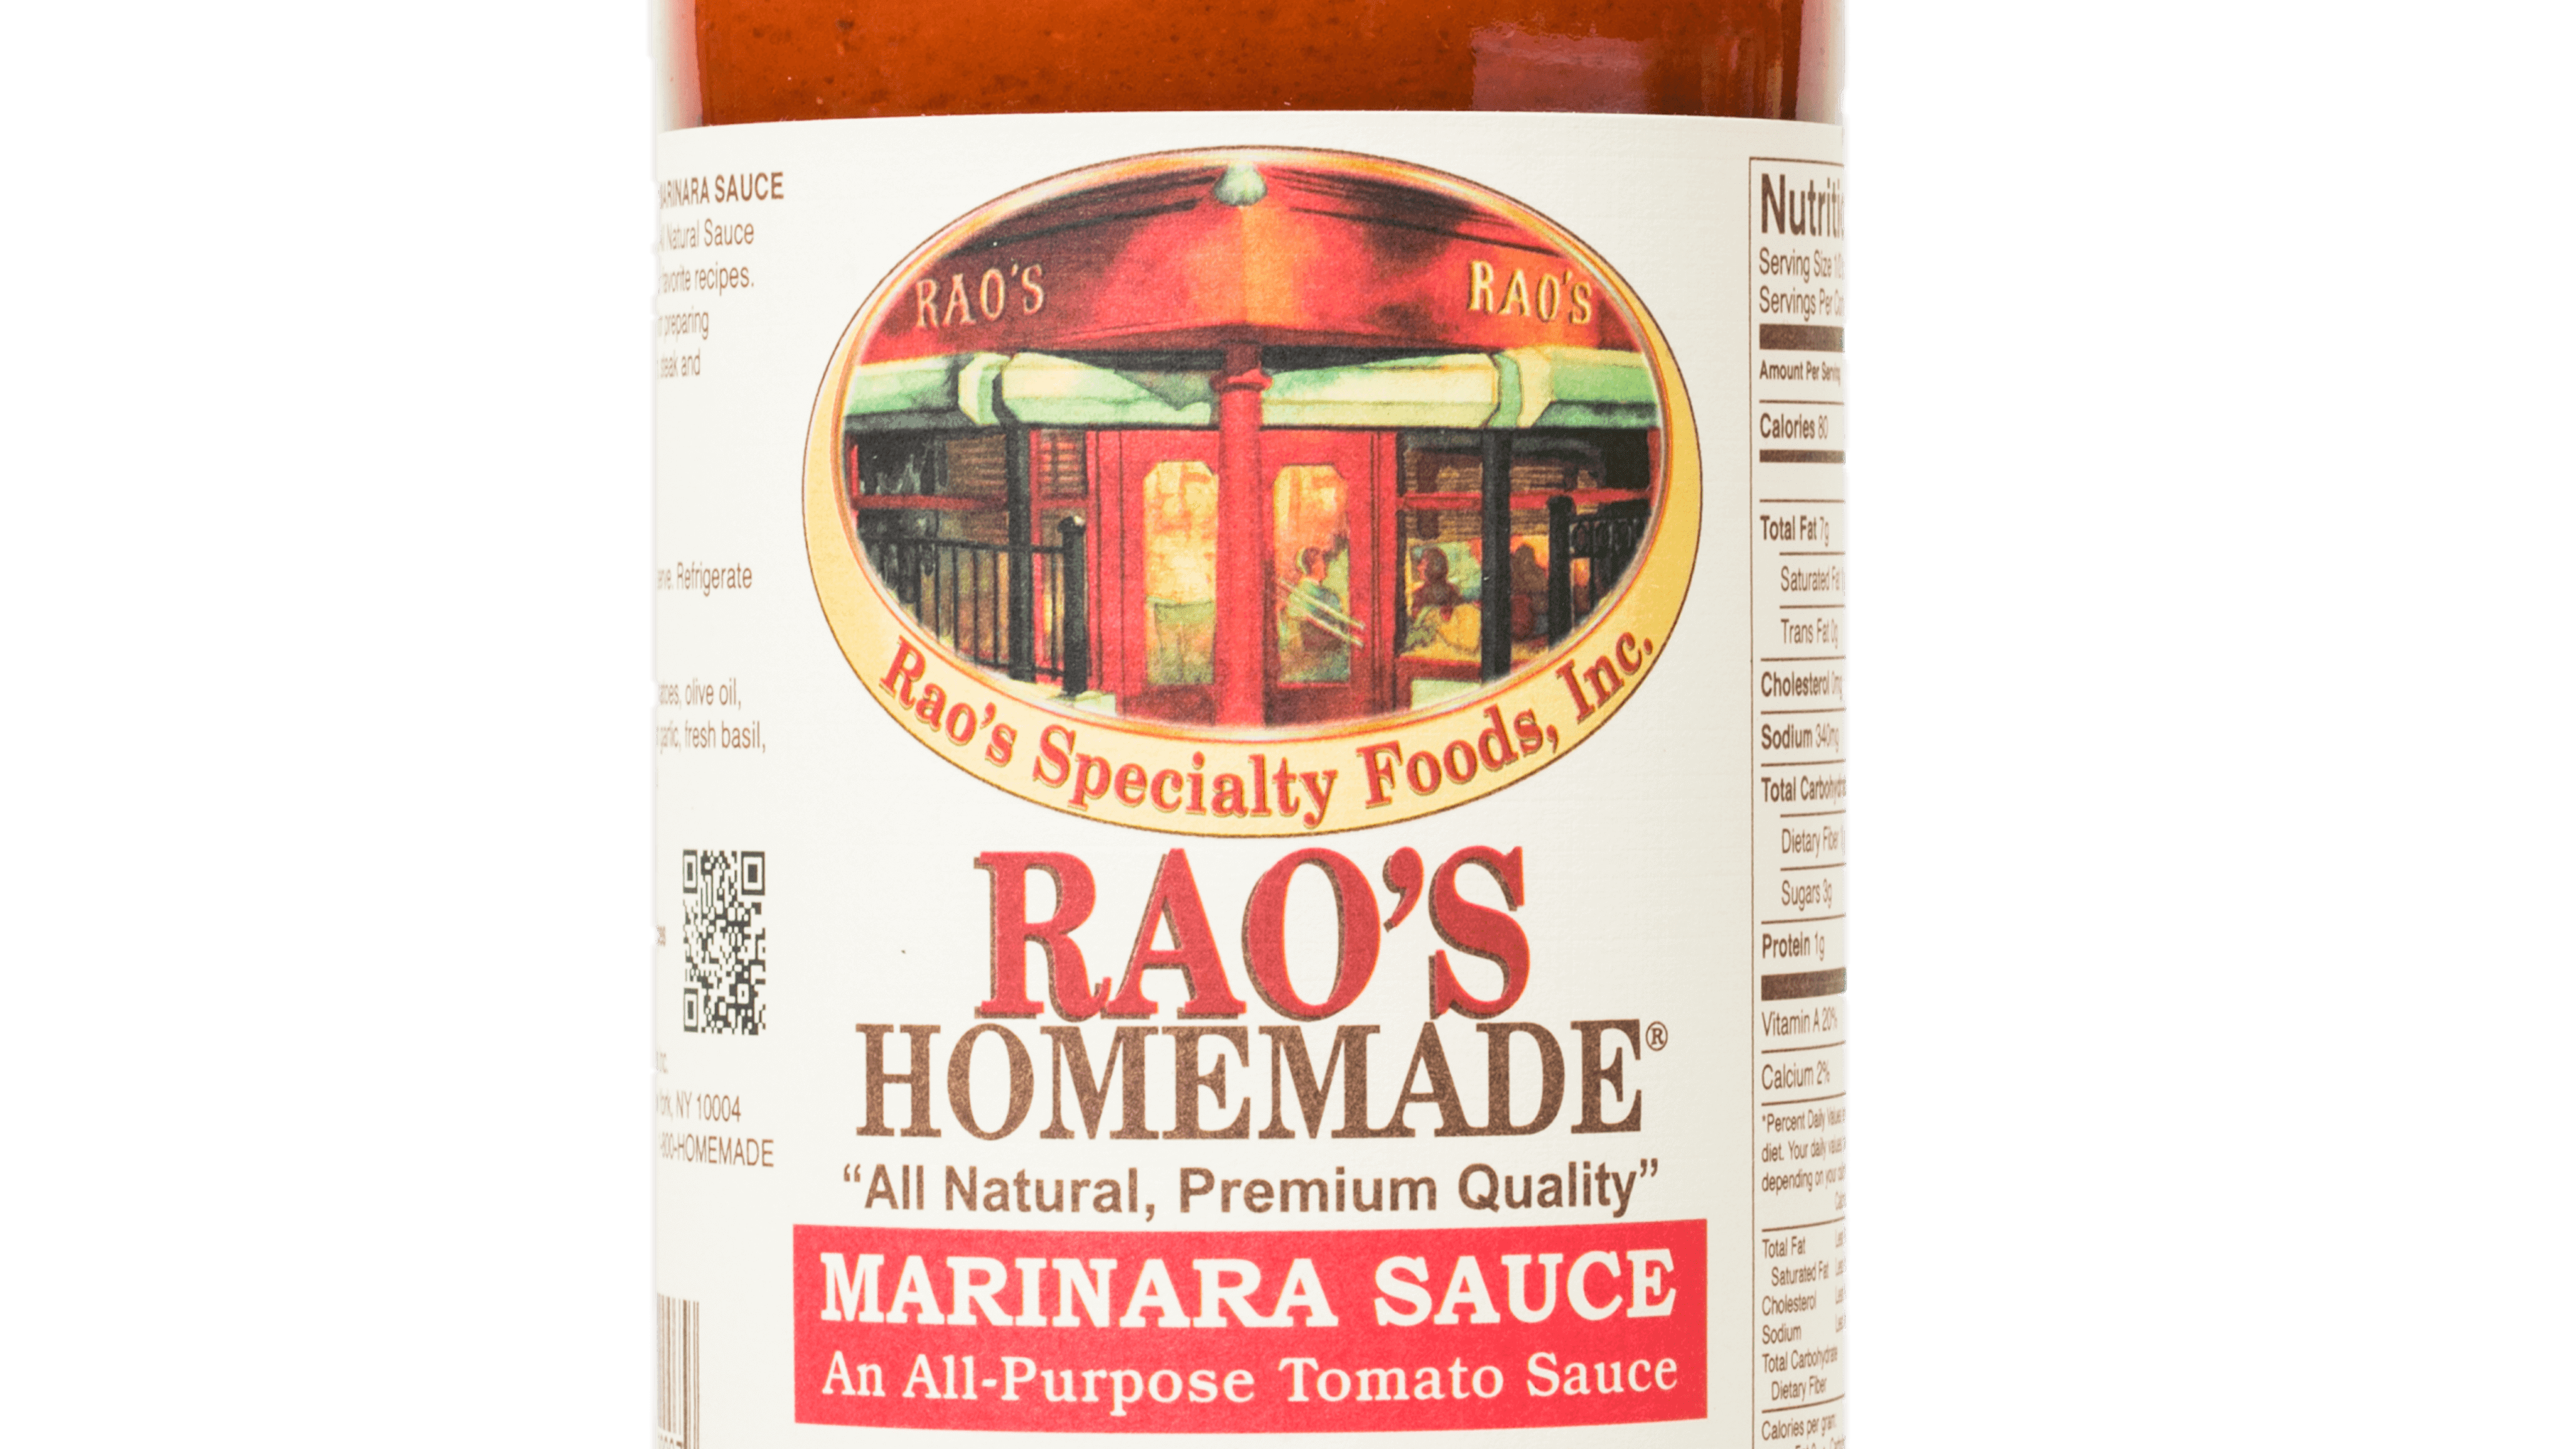 39431 sil pastasauce raos homemade marinara sauce